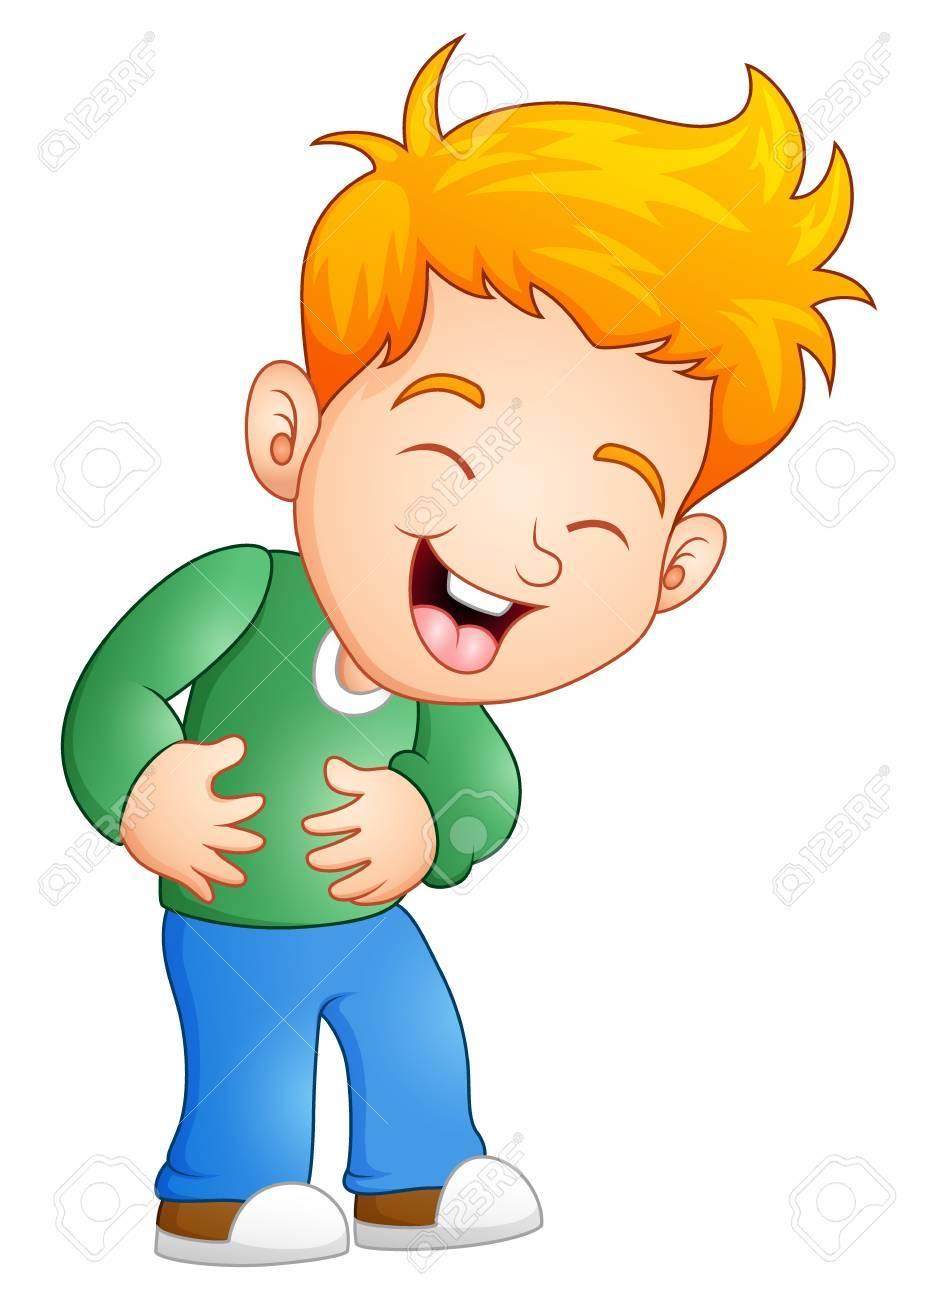 image free download Kids laughing clipart. Kid portal .